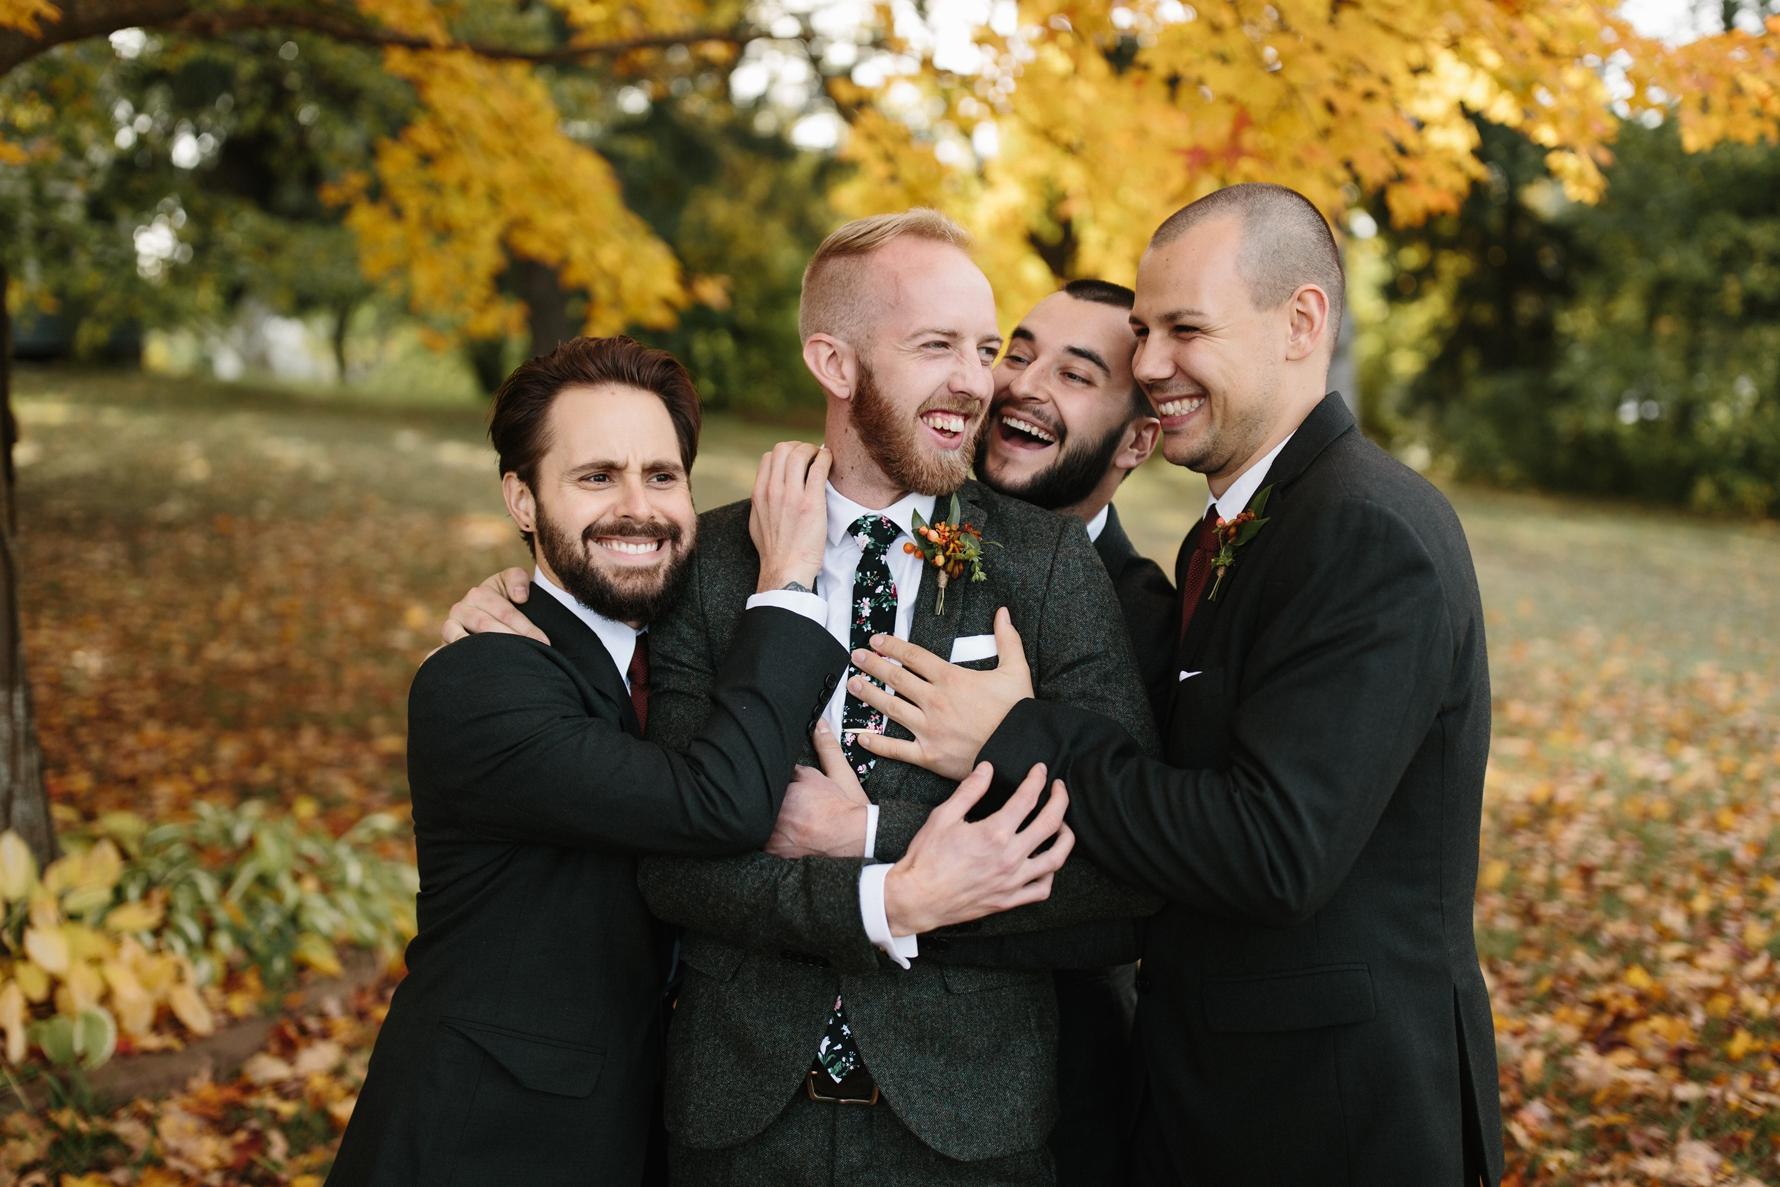 norris-traverse-city-wedding-33.JPG